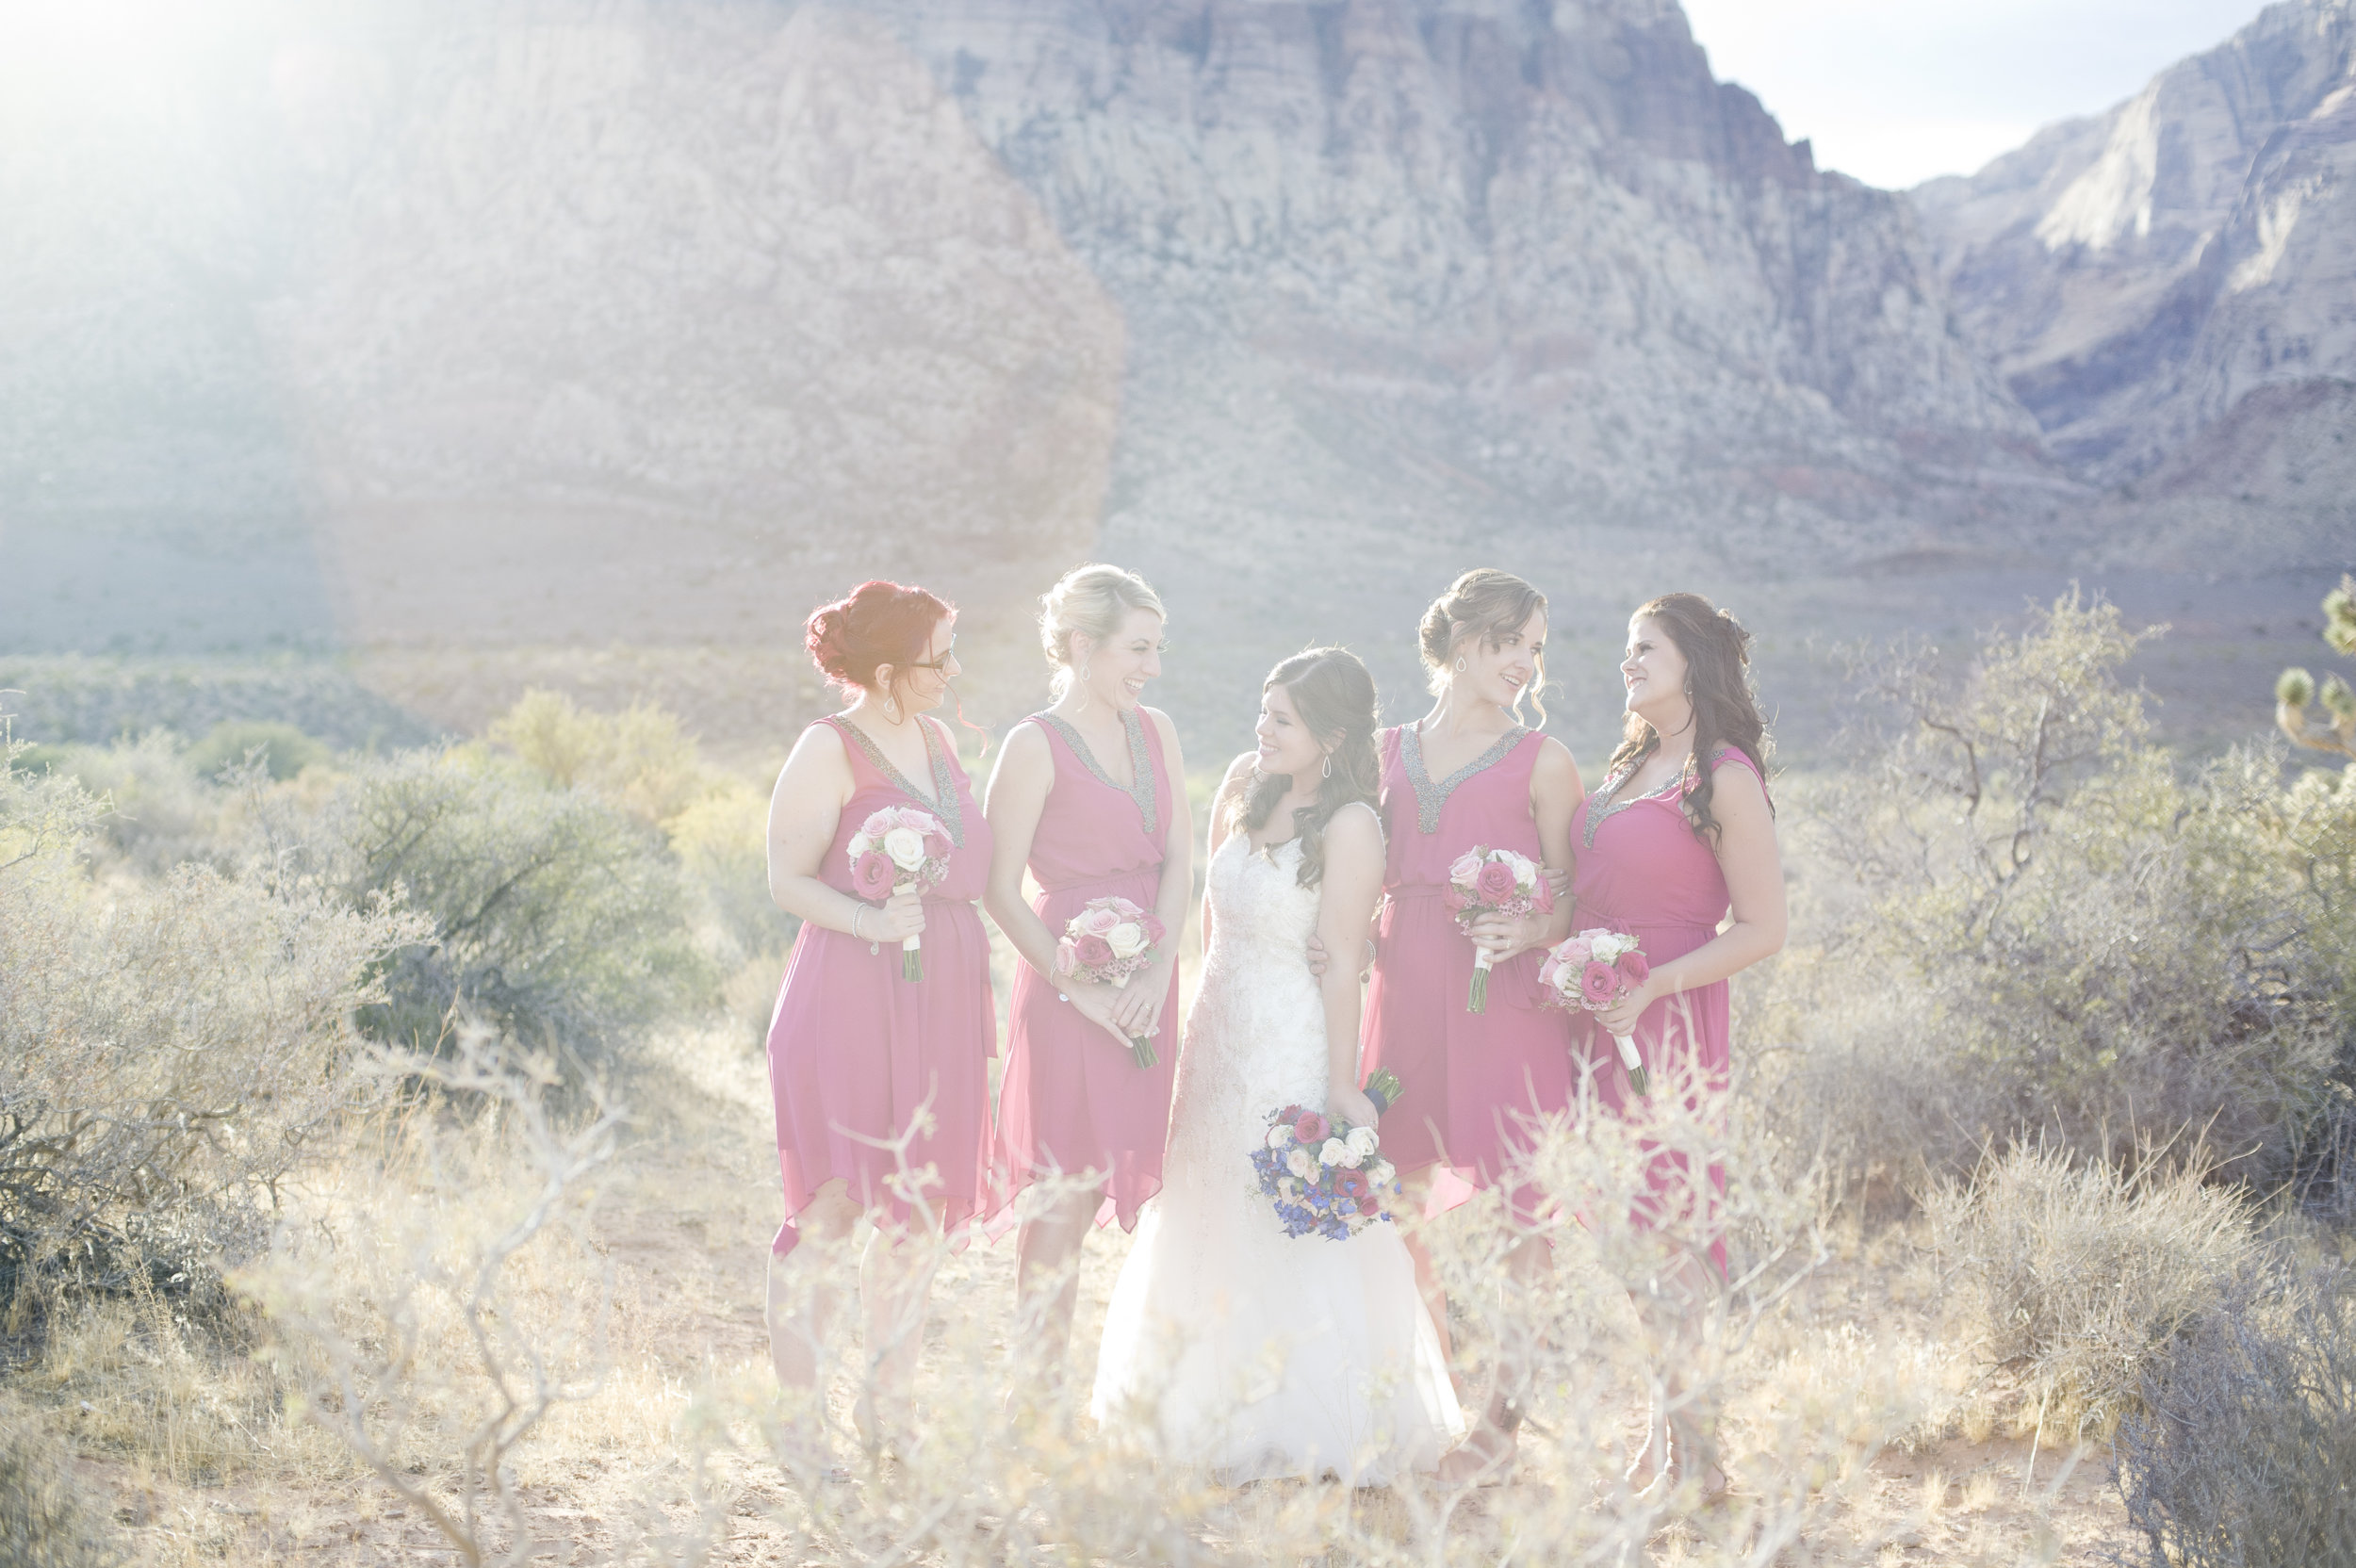 cili-bali-hai-golf-club-las-vegas-wedding-51.jpg